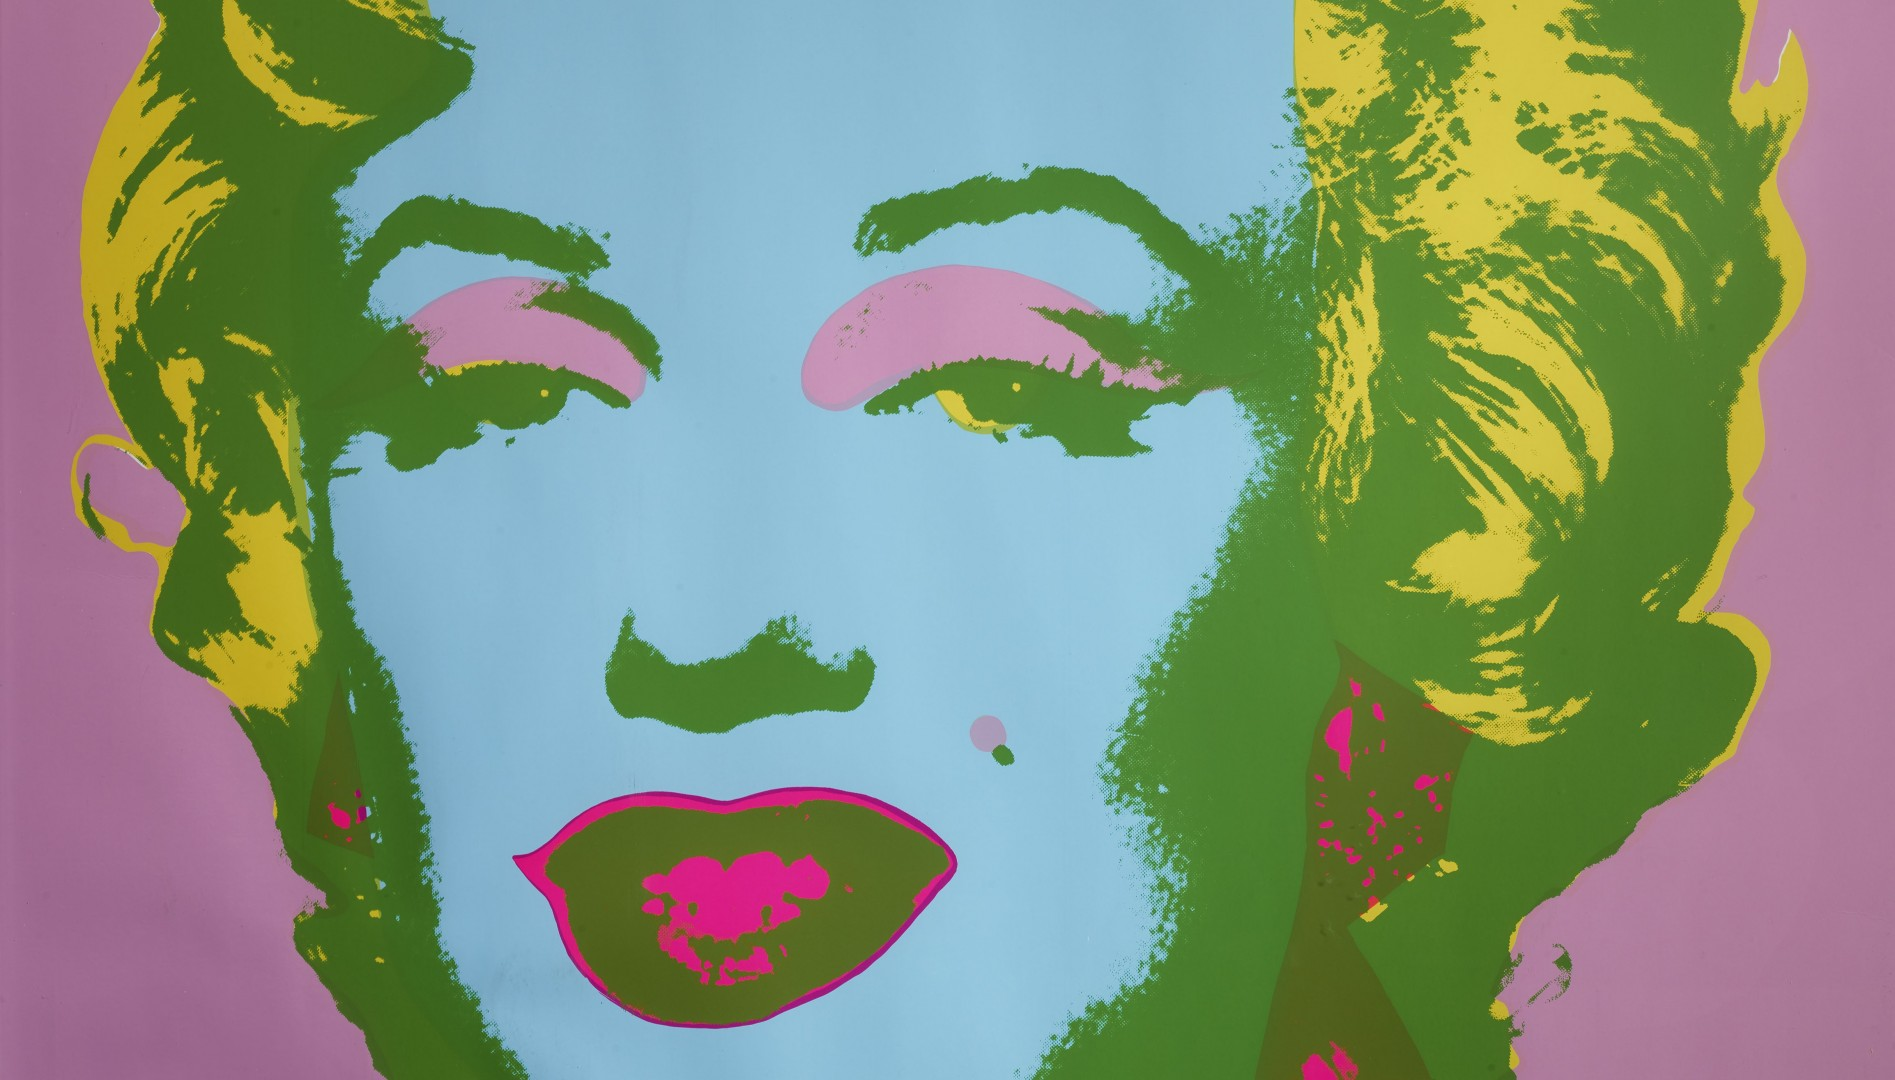 <br><br>Andy Warhol. Pop Art Identities